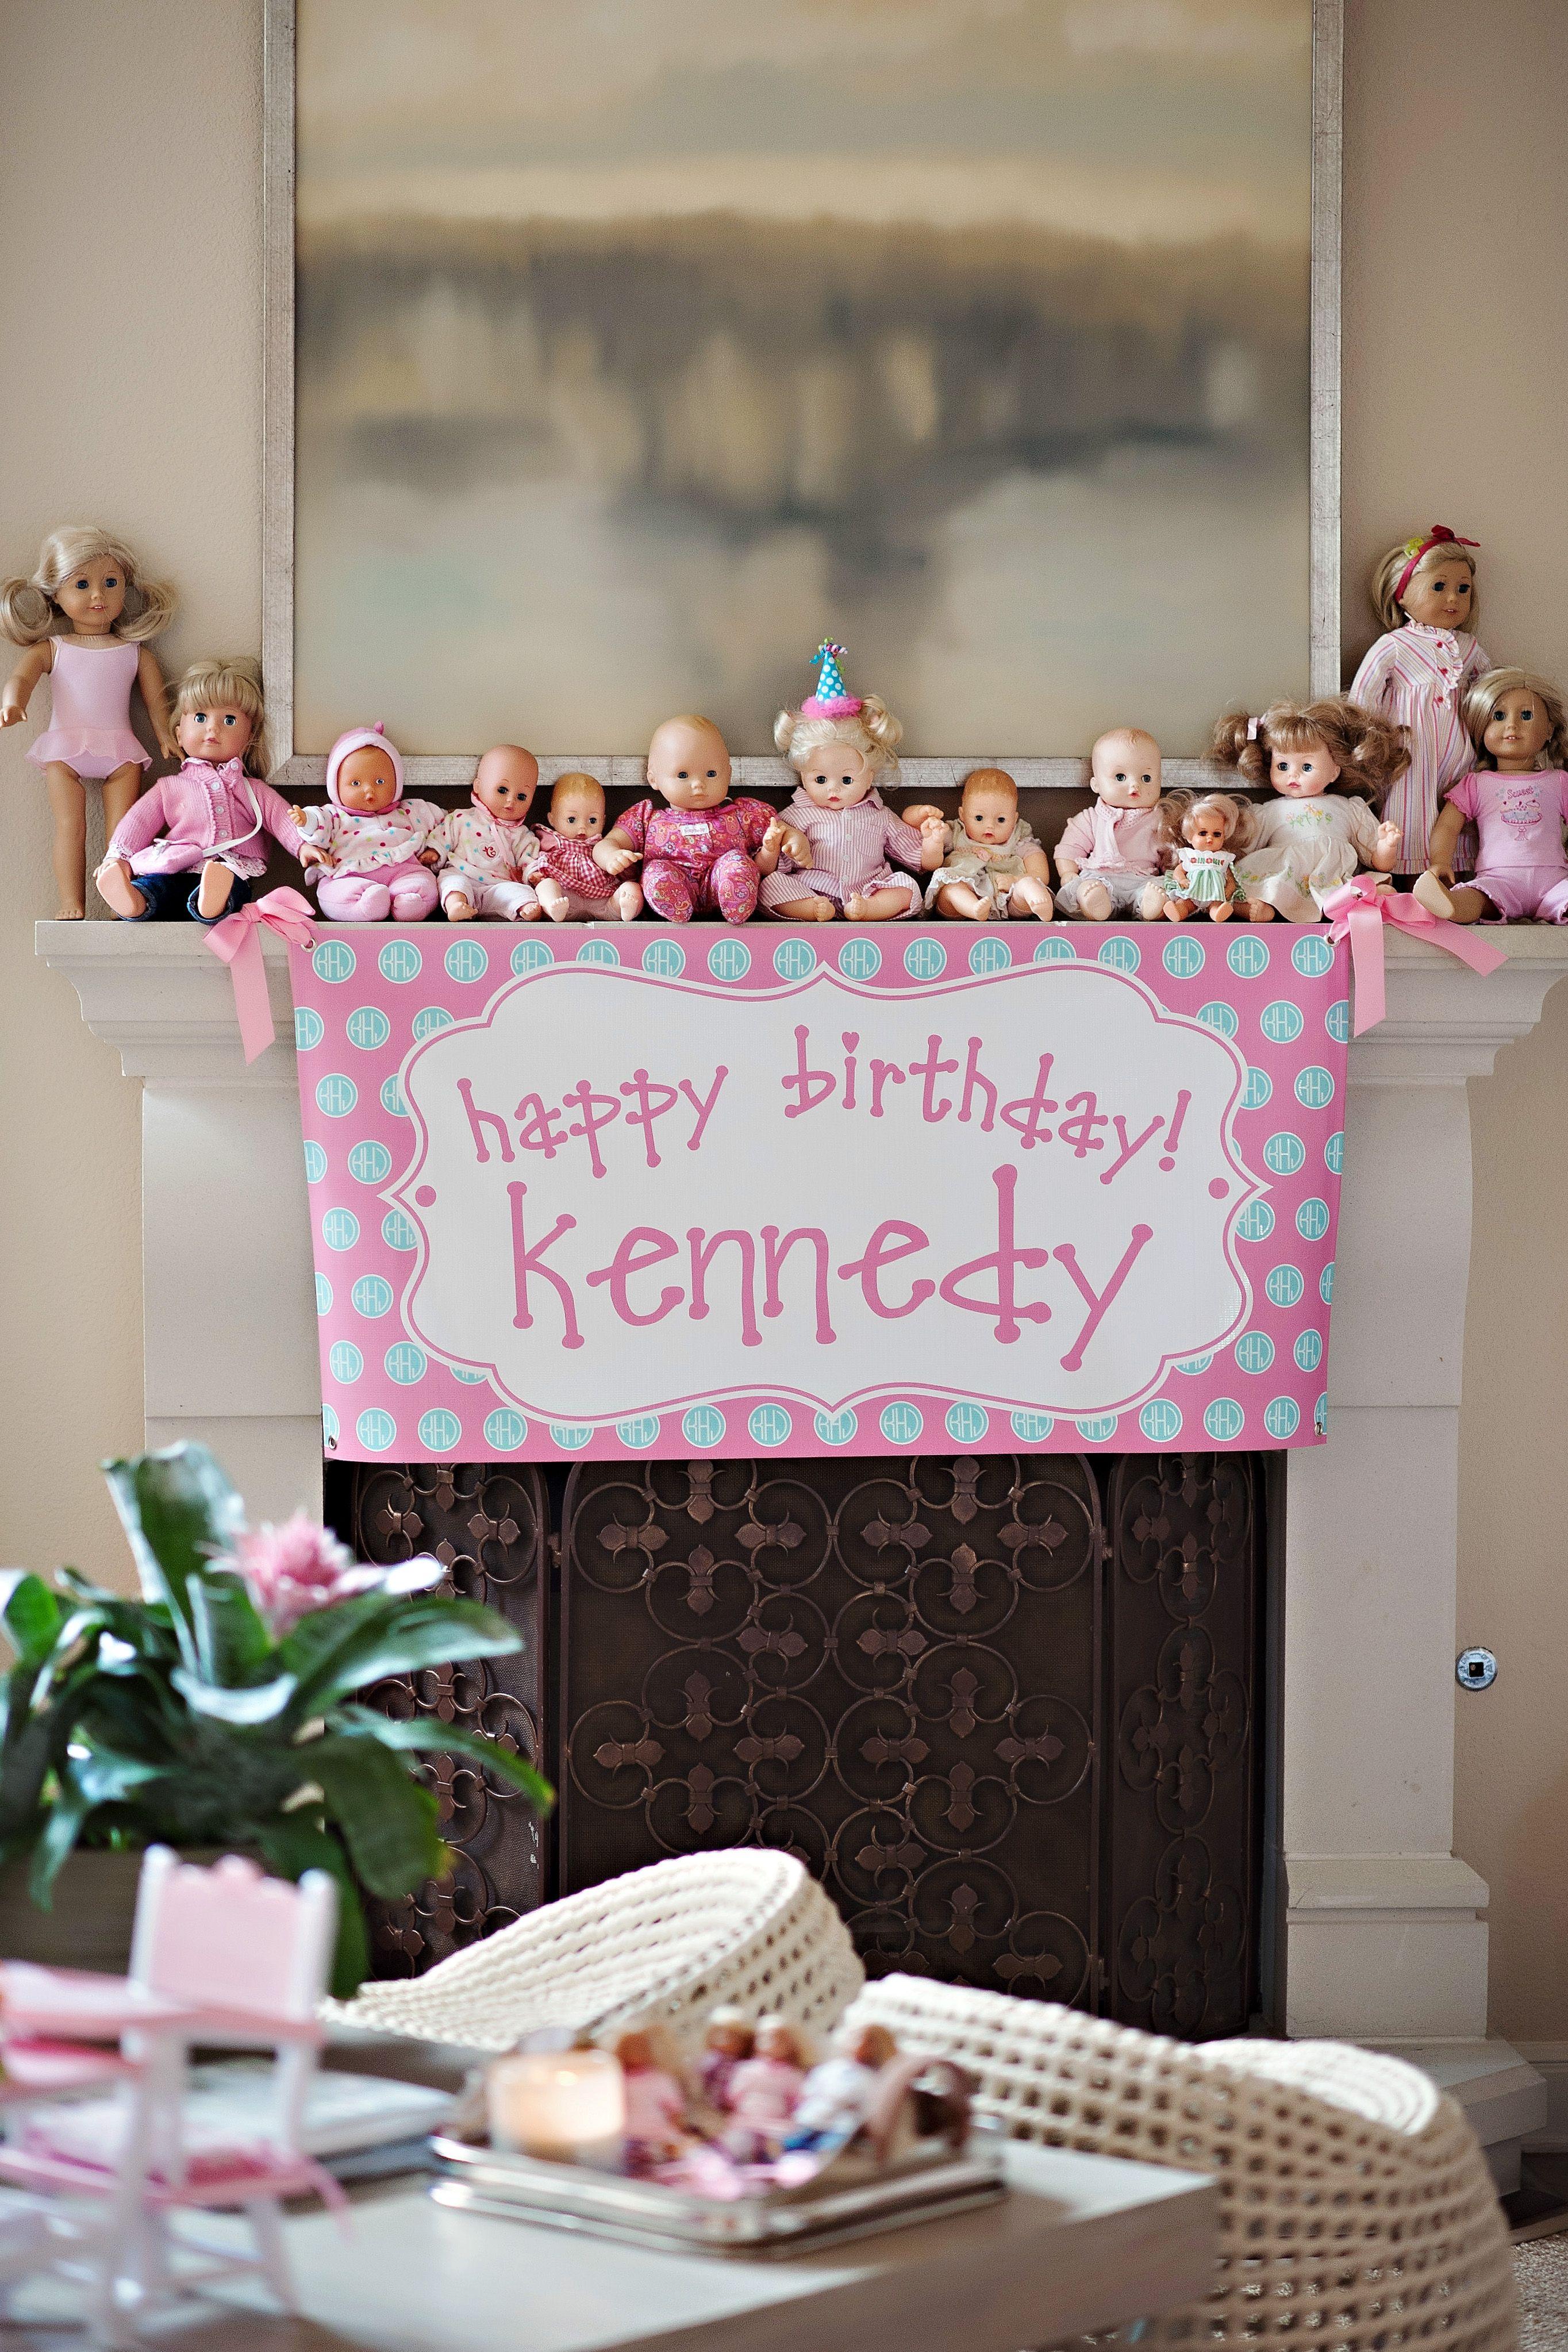 Custom Birthday Banner By Murchison Dry Goods Co Www Murchisondrygoods Com Babydollparty Tea Party Birthday Doll Tea Party Custom Birthday Banners